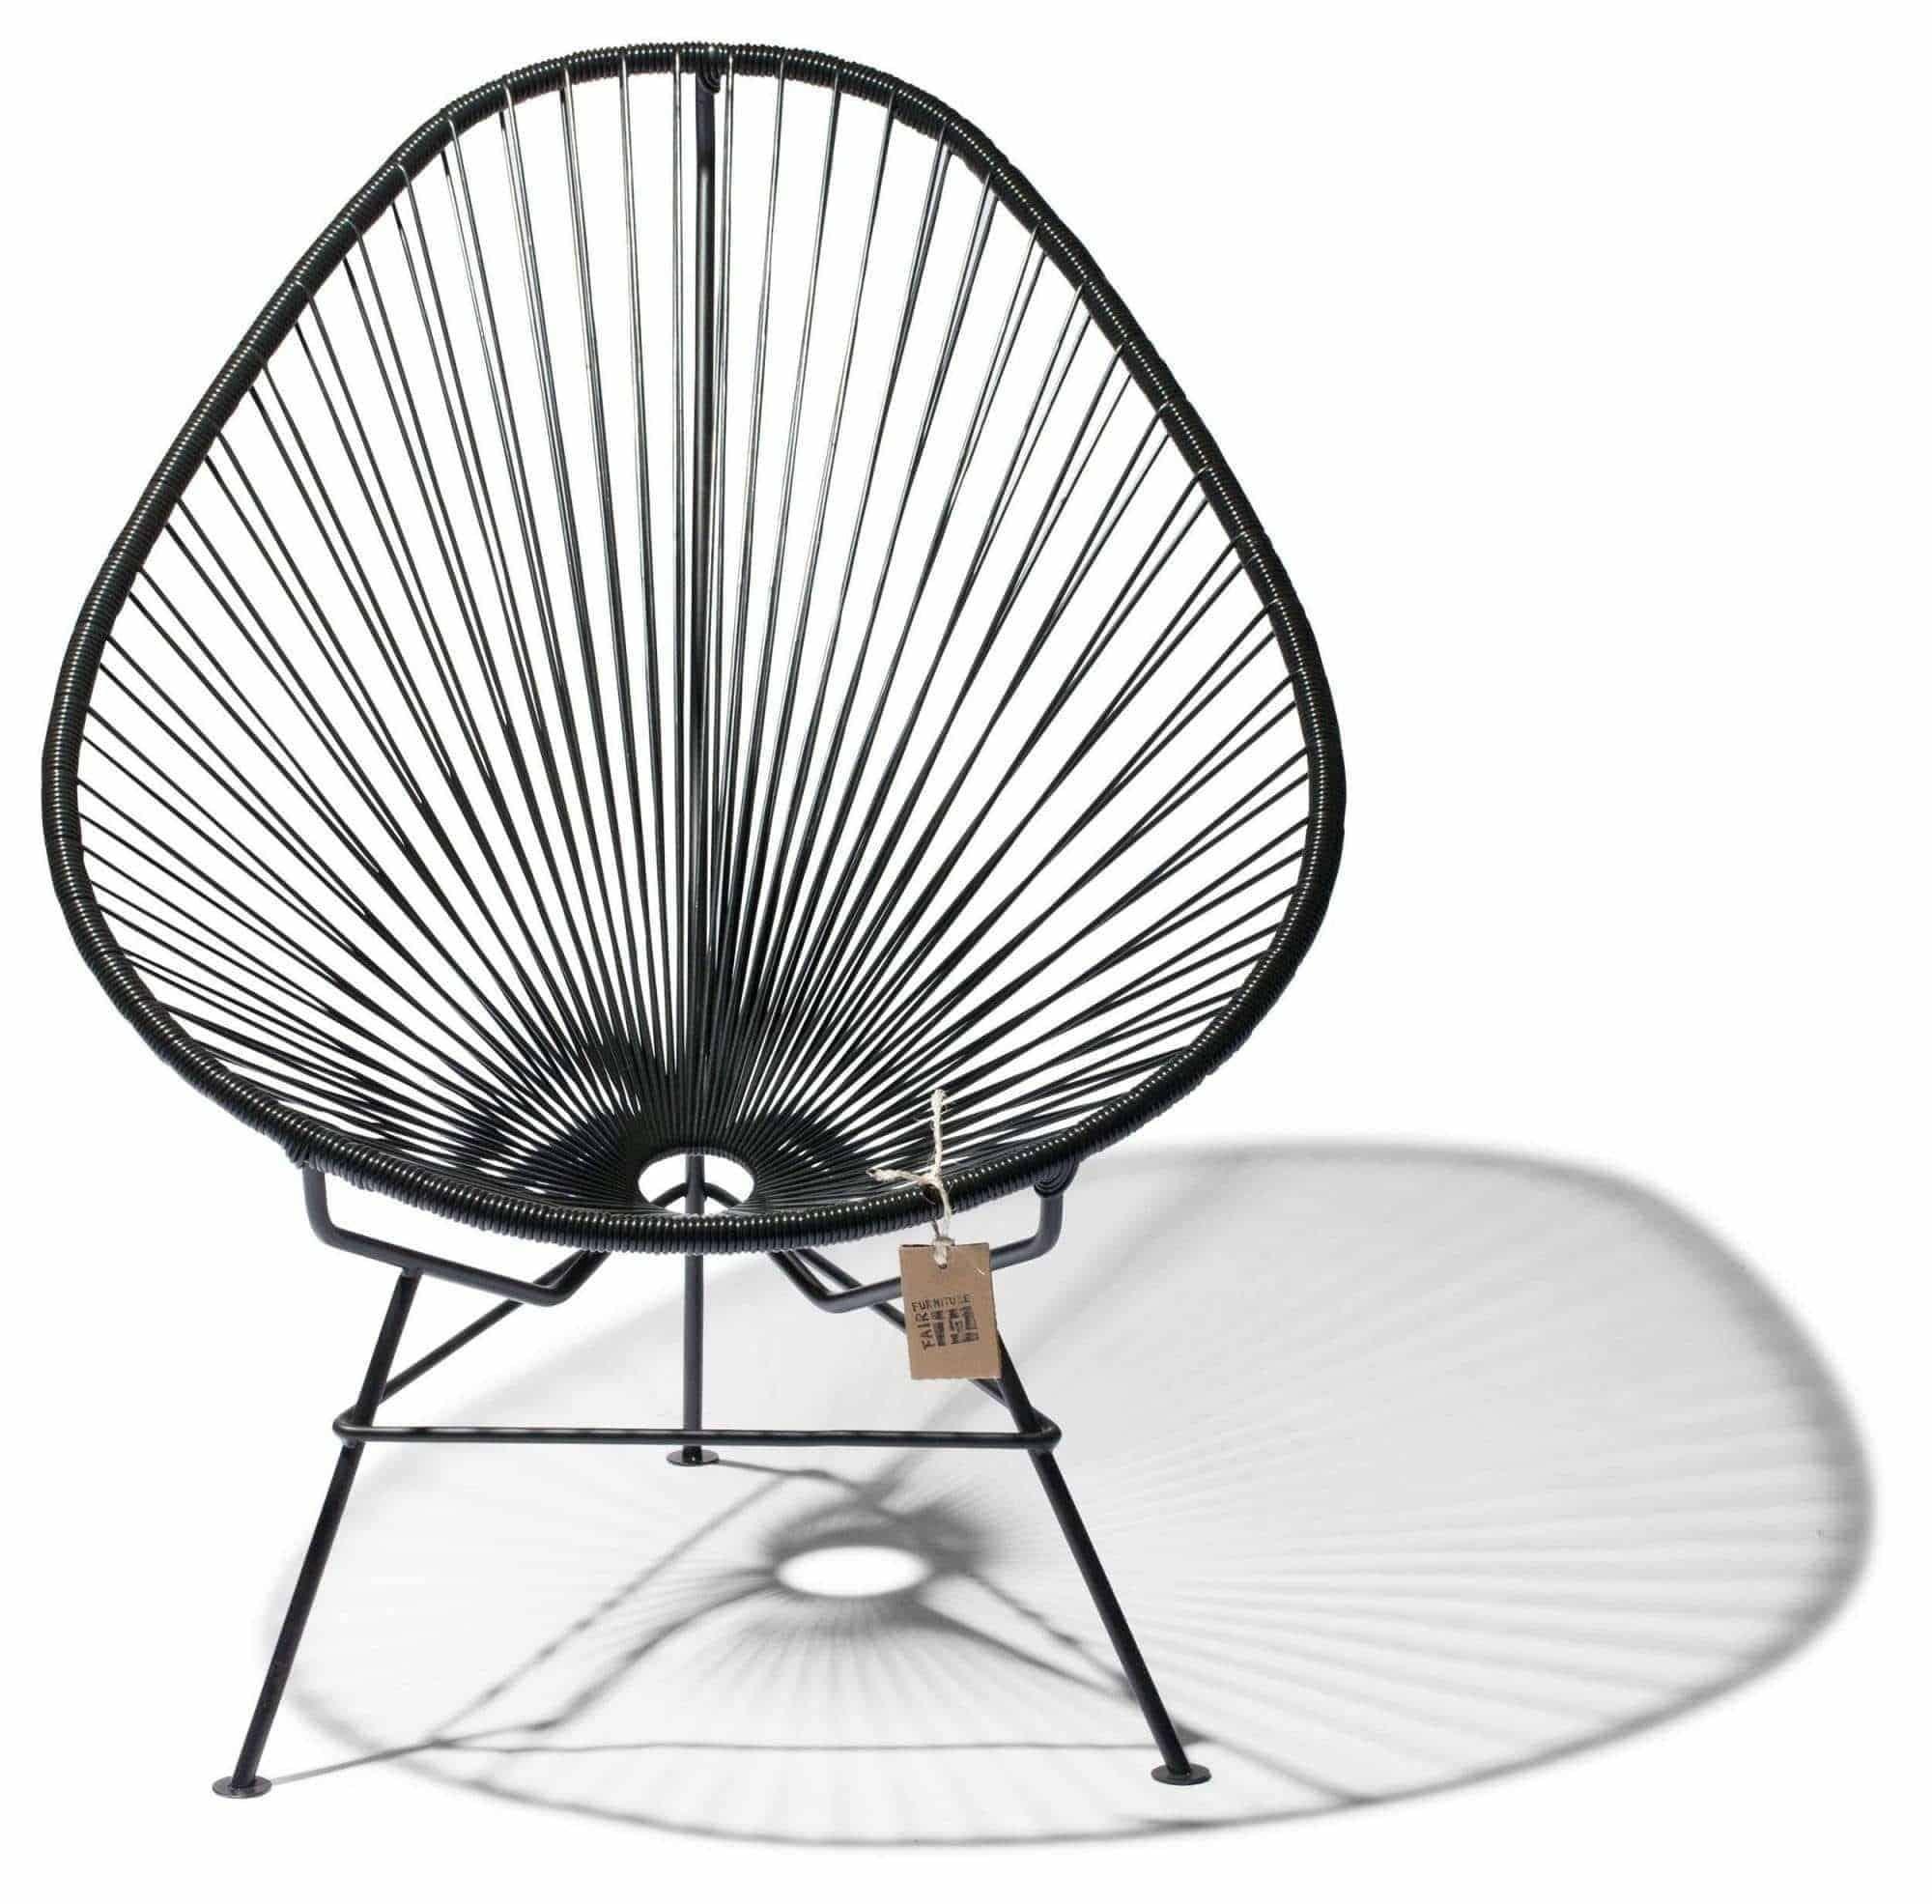 Classic Acapulco Chair online at FairFurniture.com